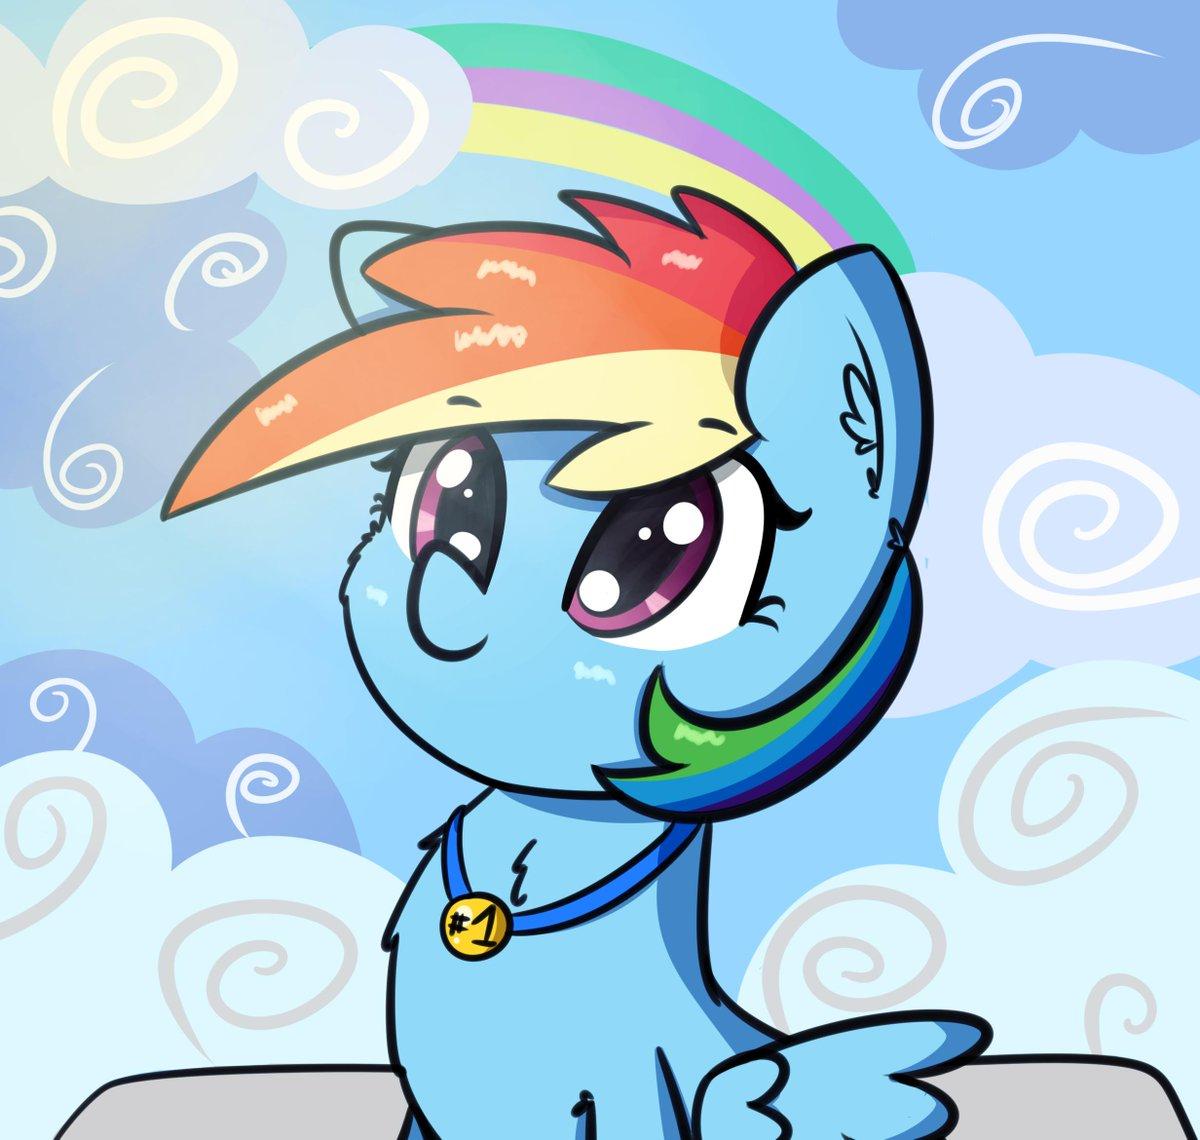 She won. #mlp #RainbowDash #brony<br>http://pic.twitter.com/TTkl1xHbSN